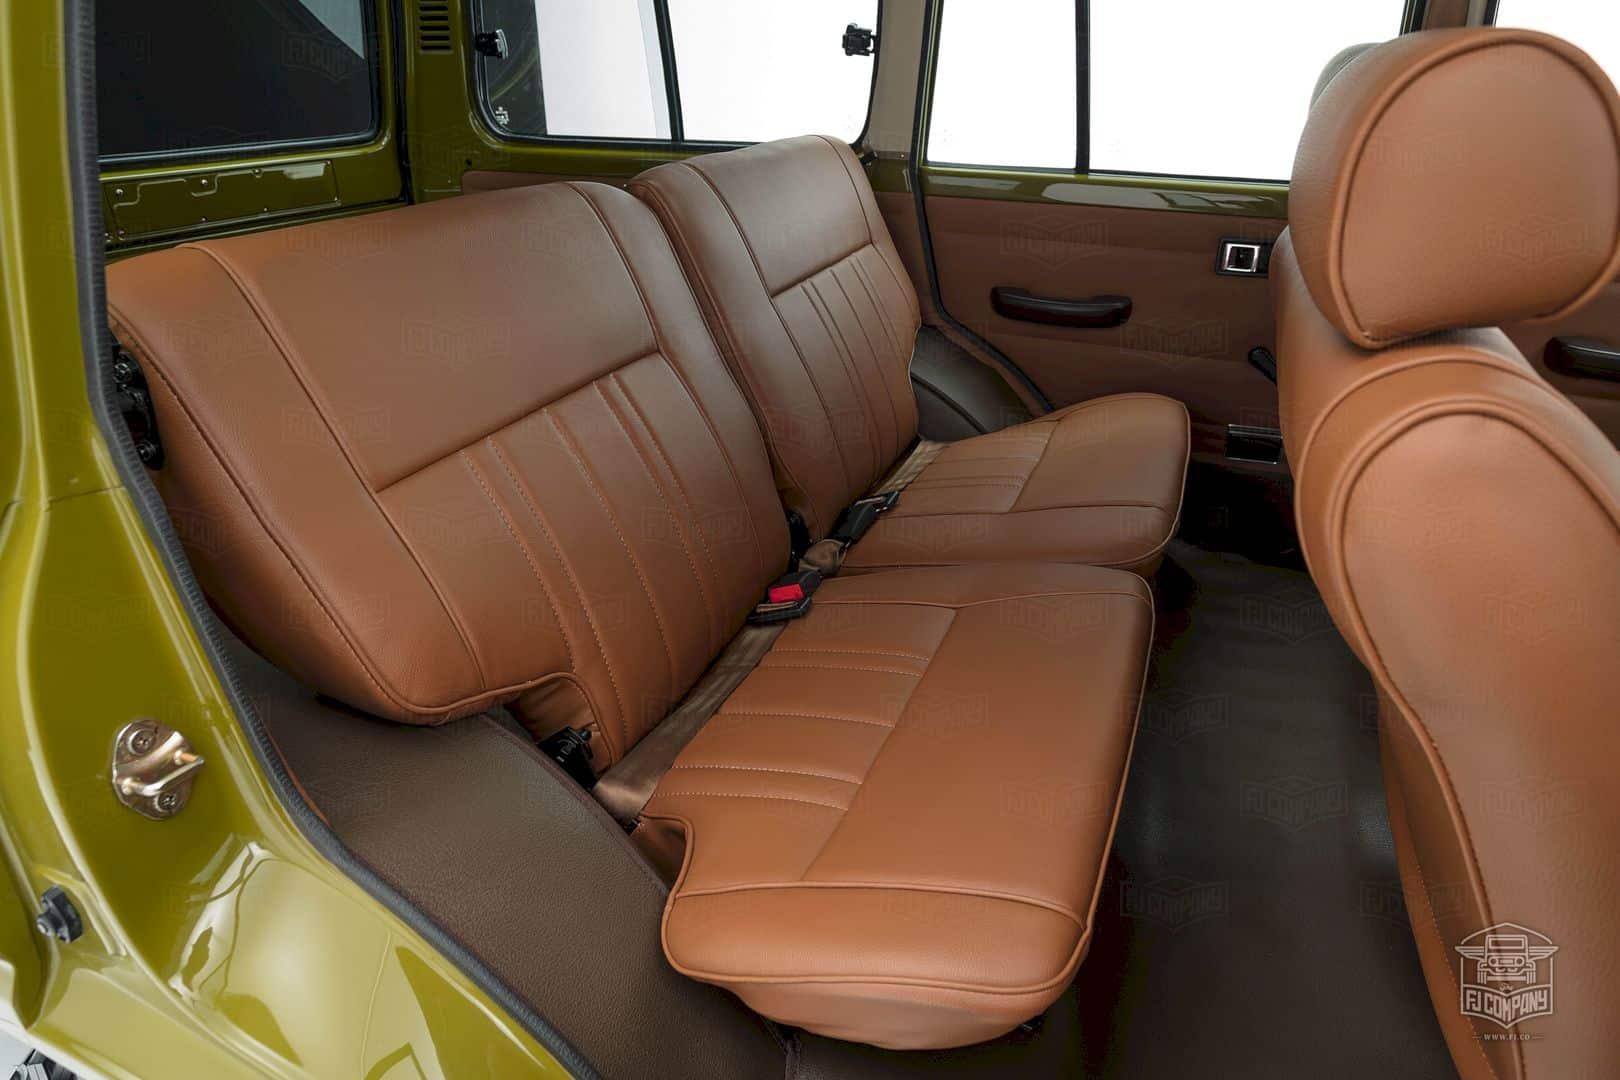 1986 Toyota Land Cruiser Fj62 Olive 3